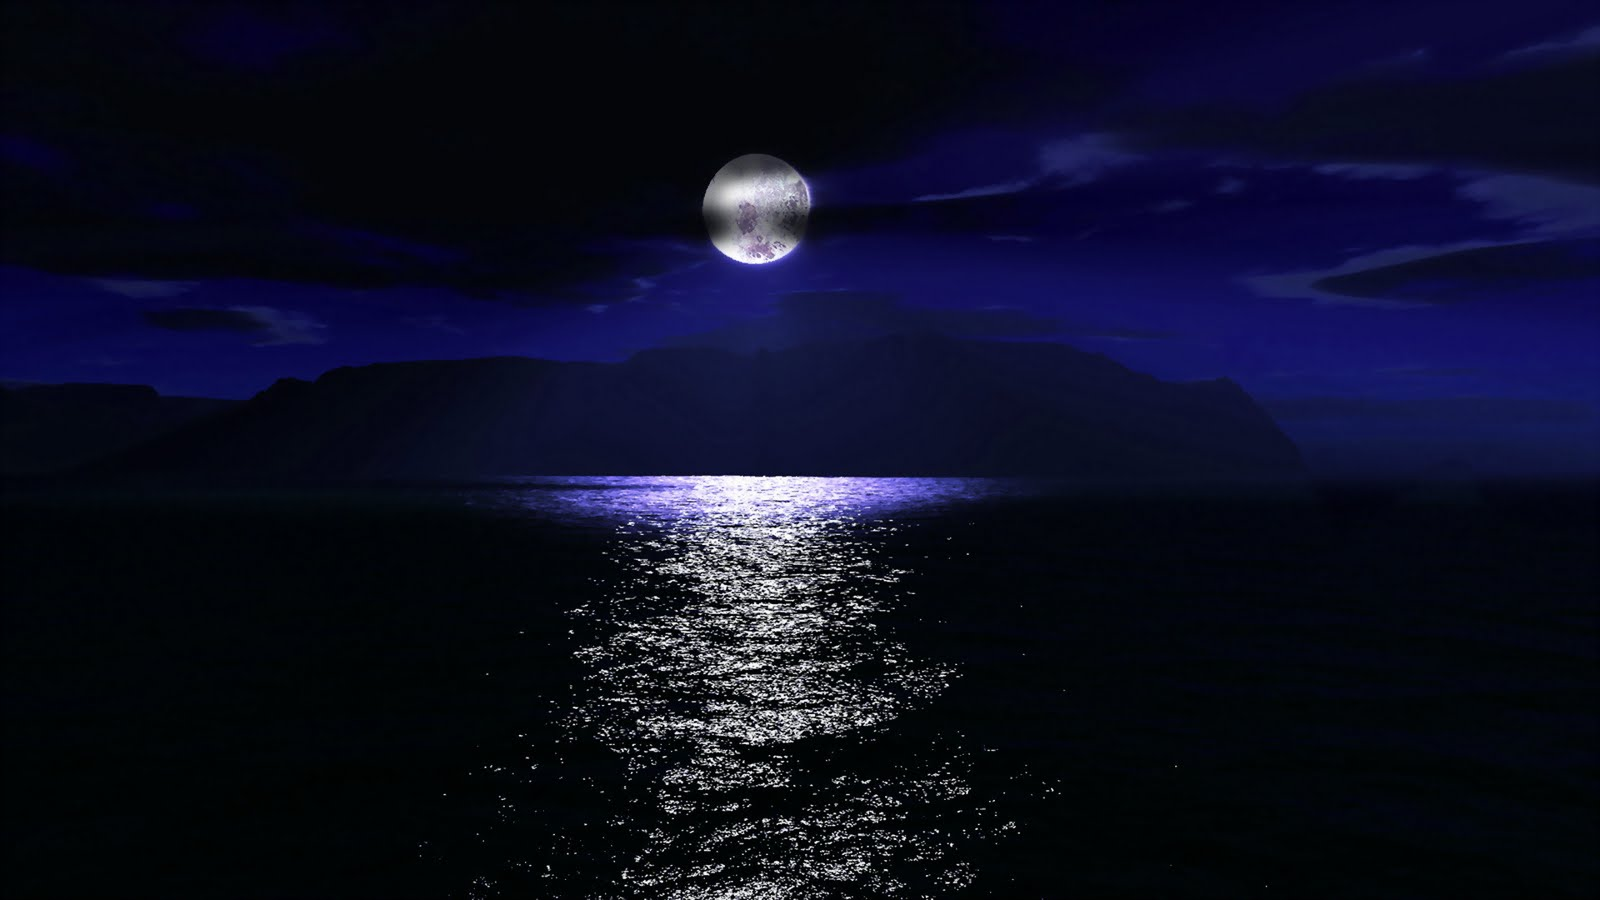 Night Wallpaper Night Sea Wallpaper 1600x900